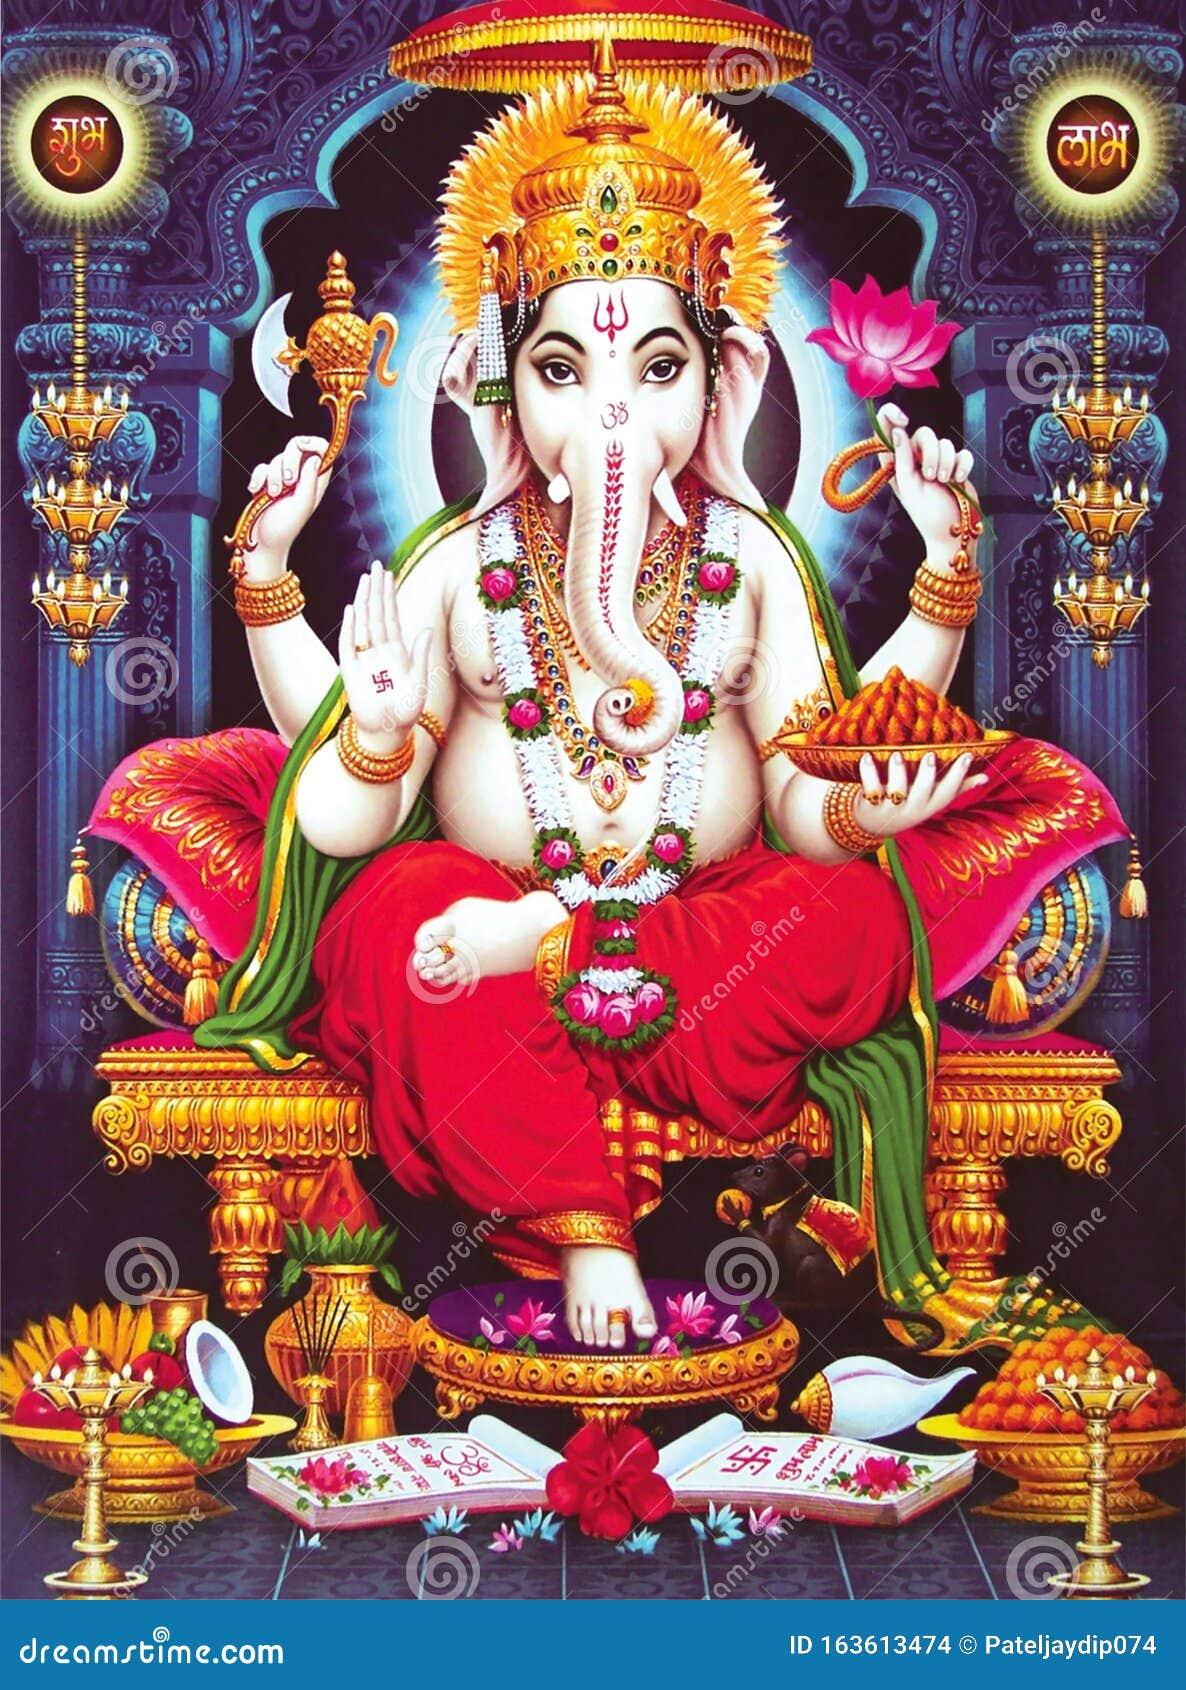 indian god ganesh wallpaper high definition lord ganesha indian god son mahadev ganpati india lord ganesha ganpati 163613474